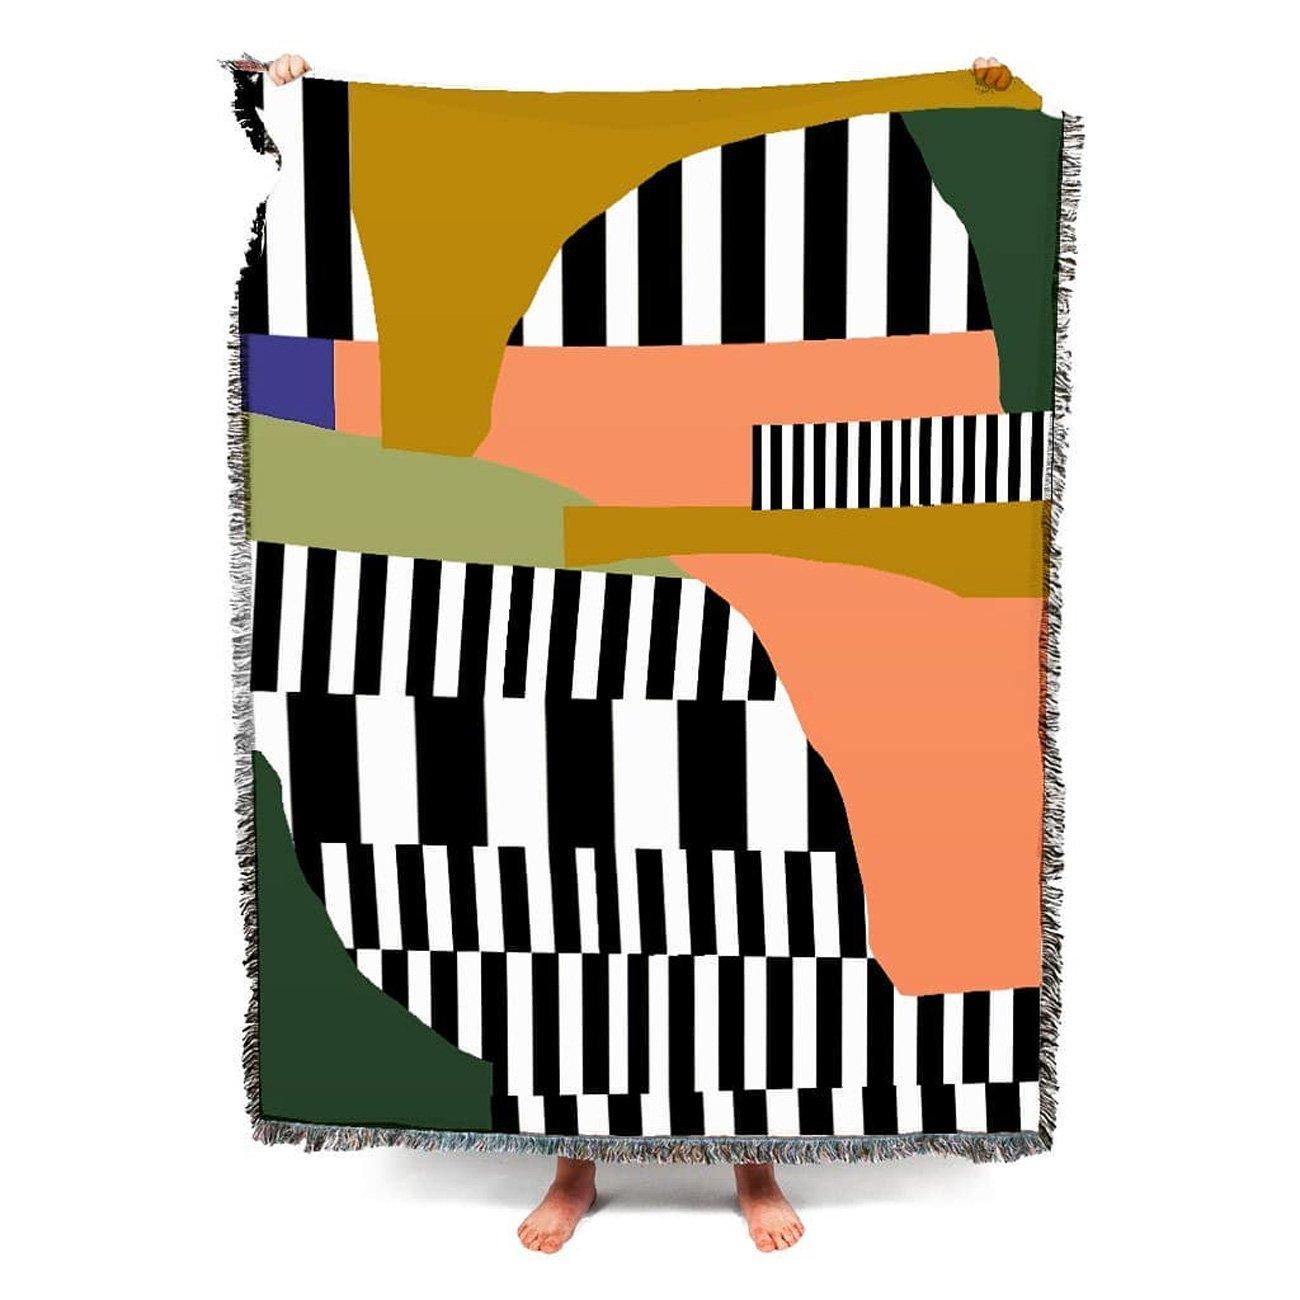 Katy Binks KB BLanket web